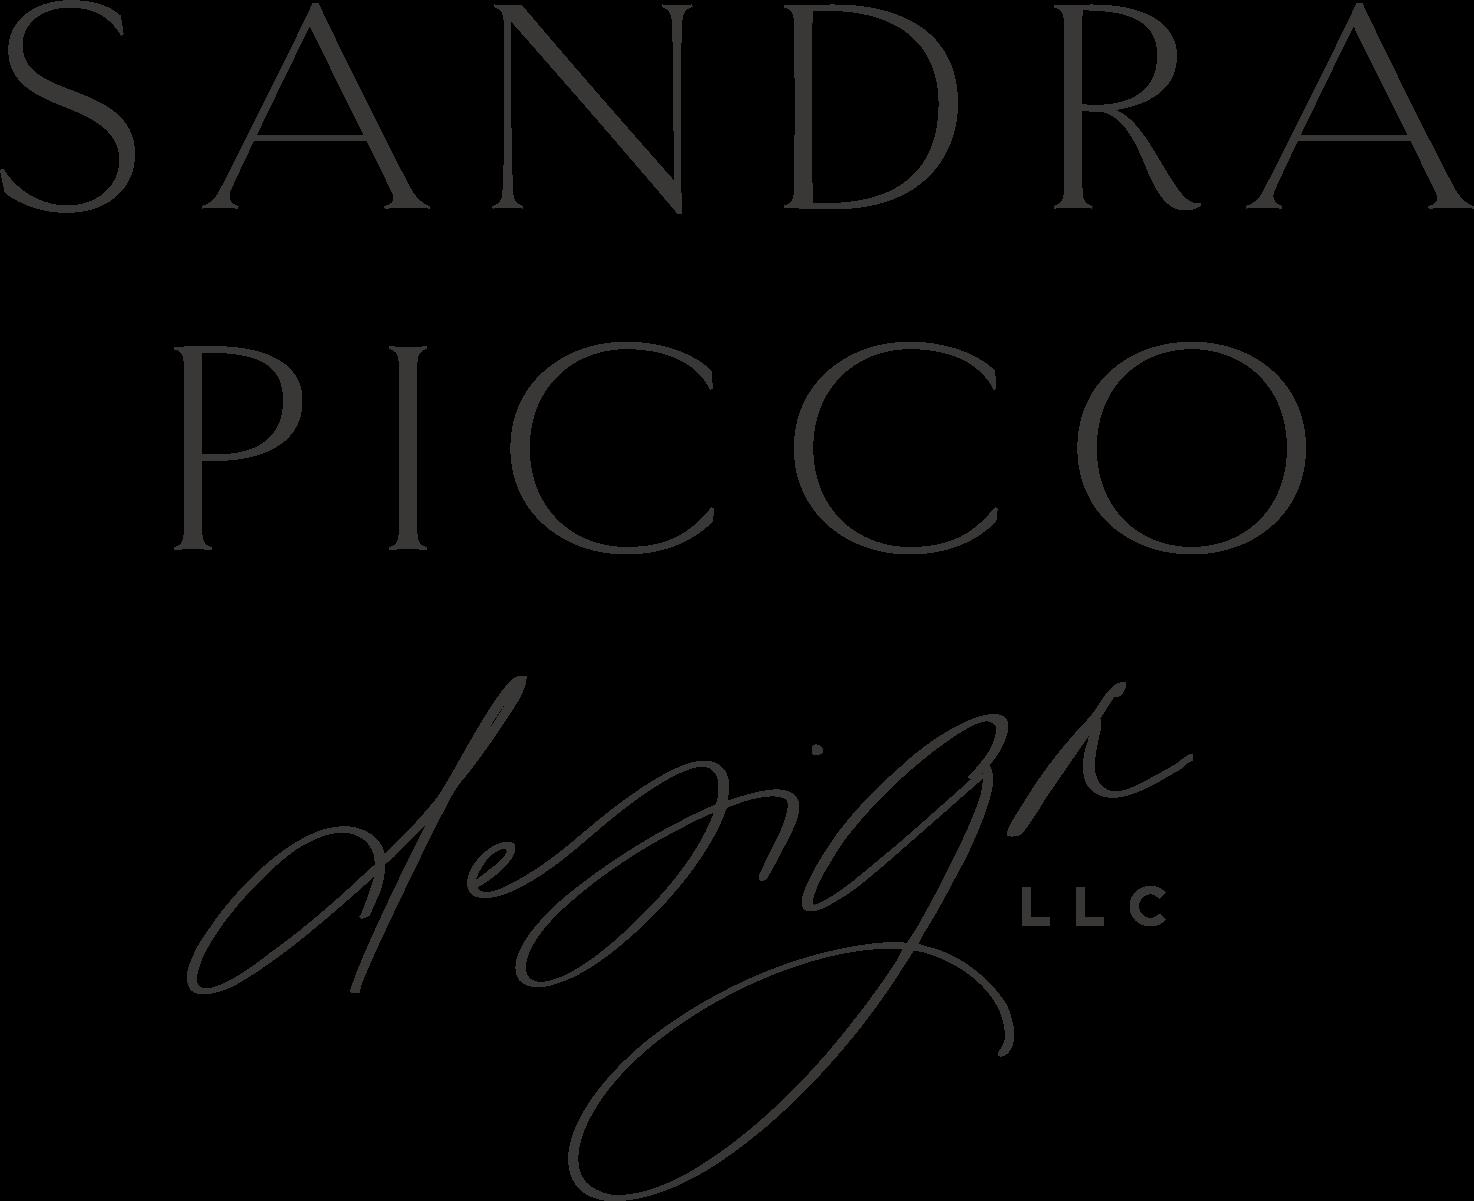 Sandra Picco Design logo